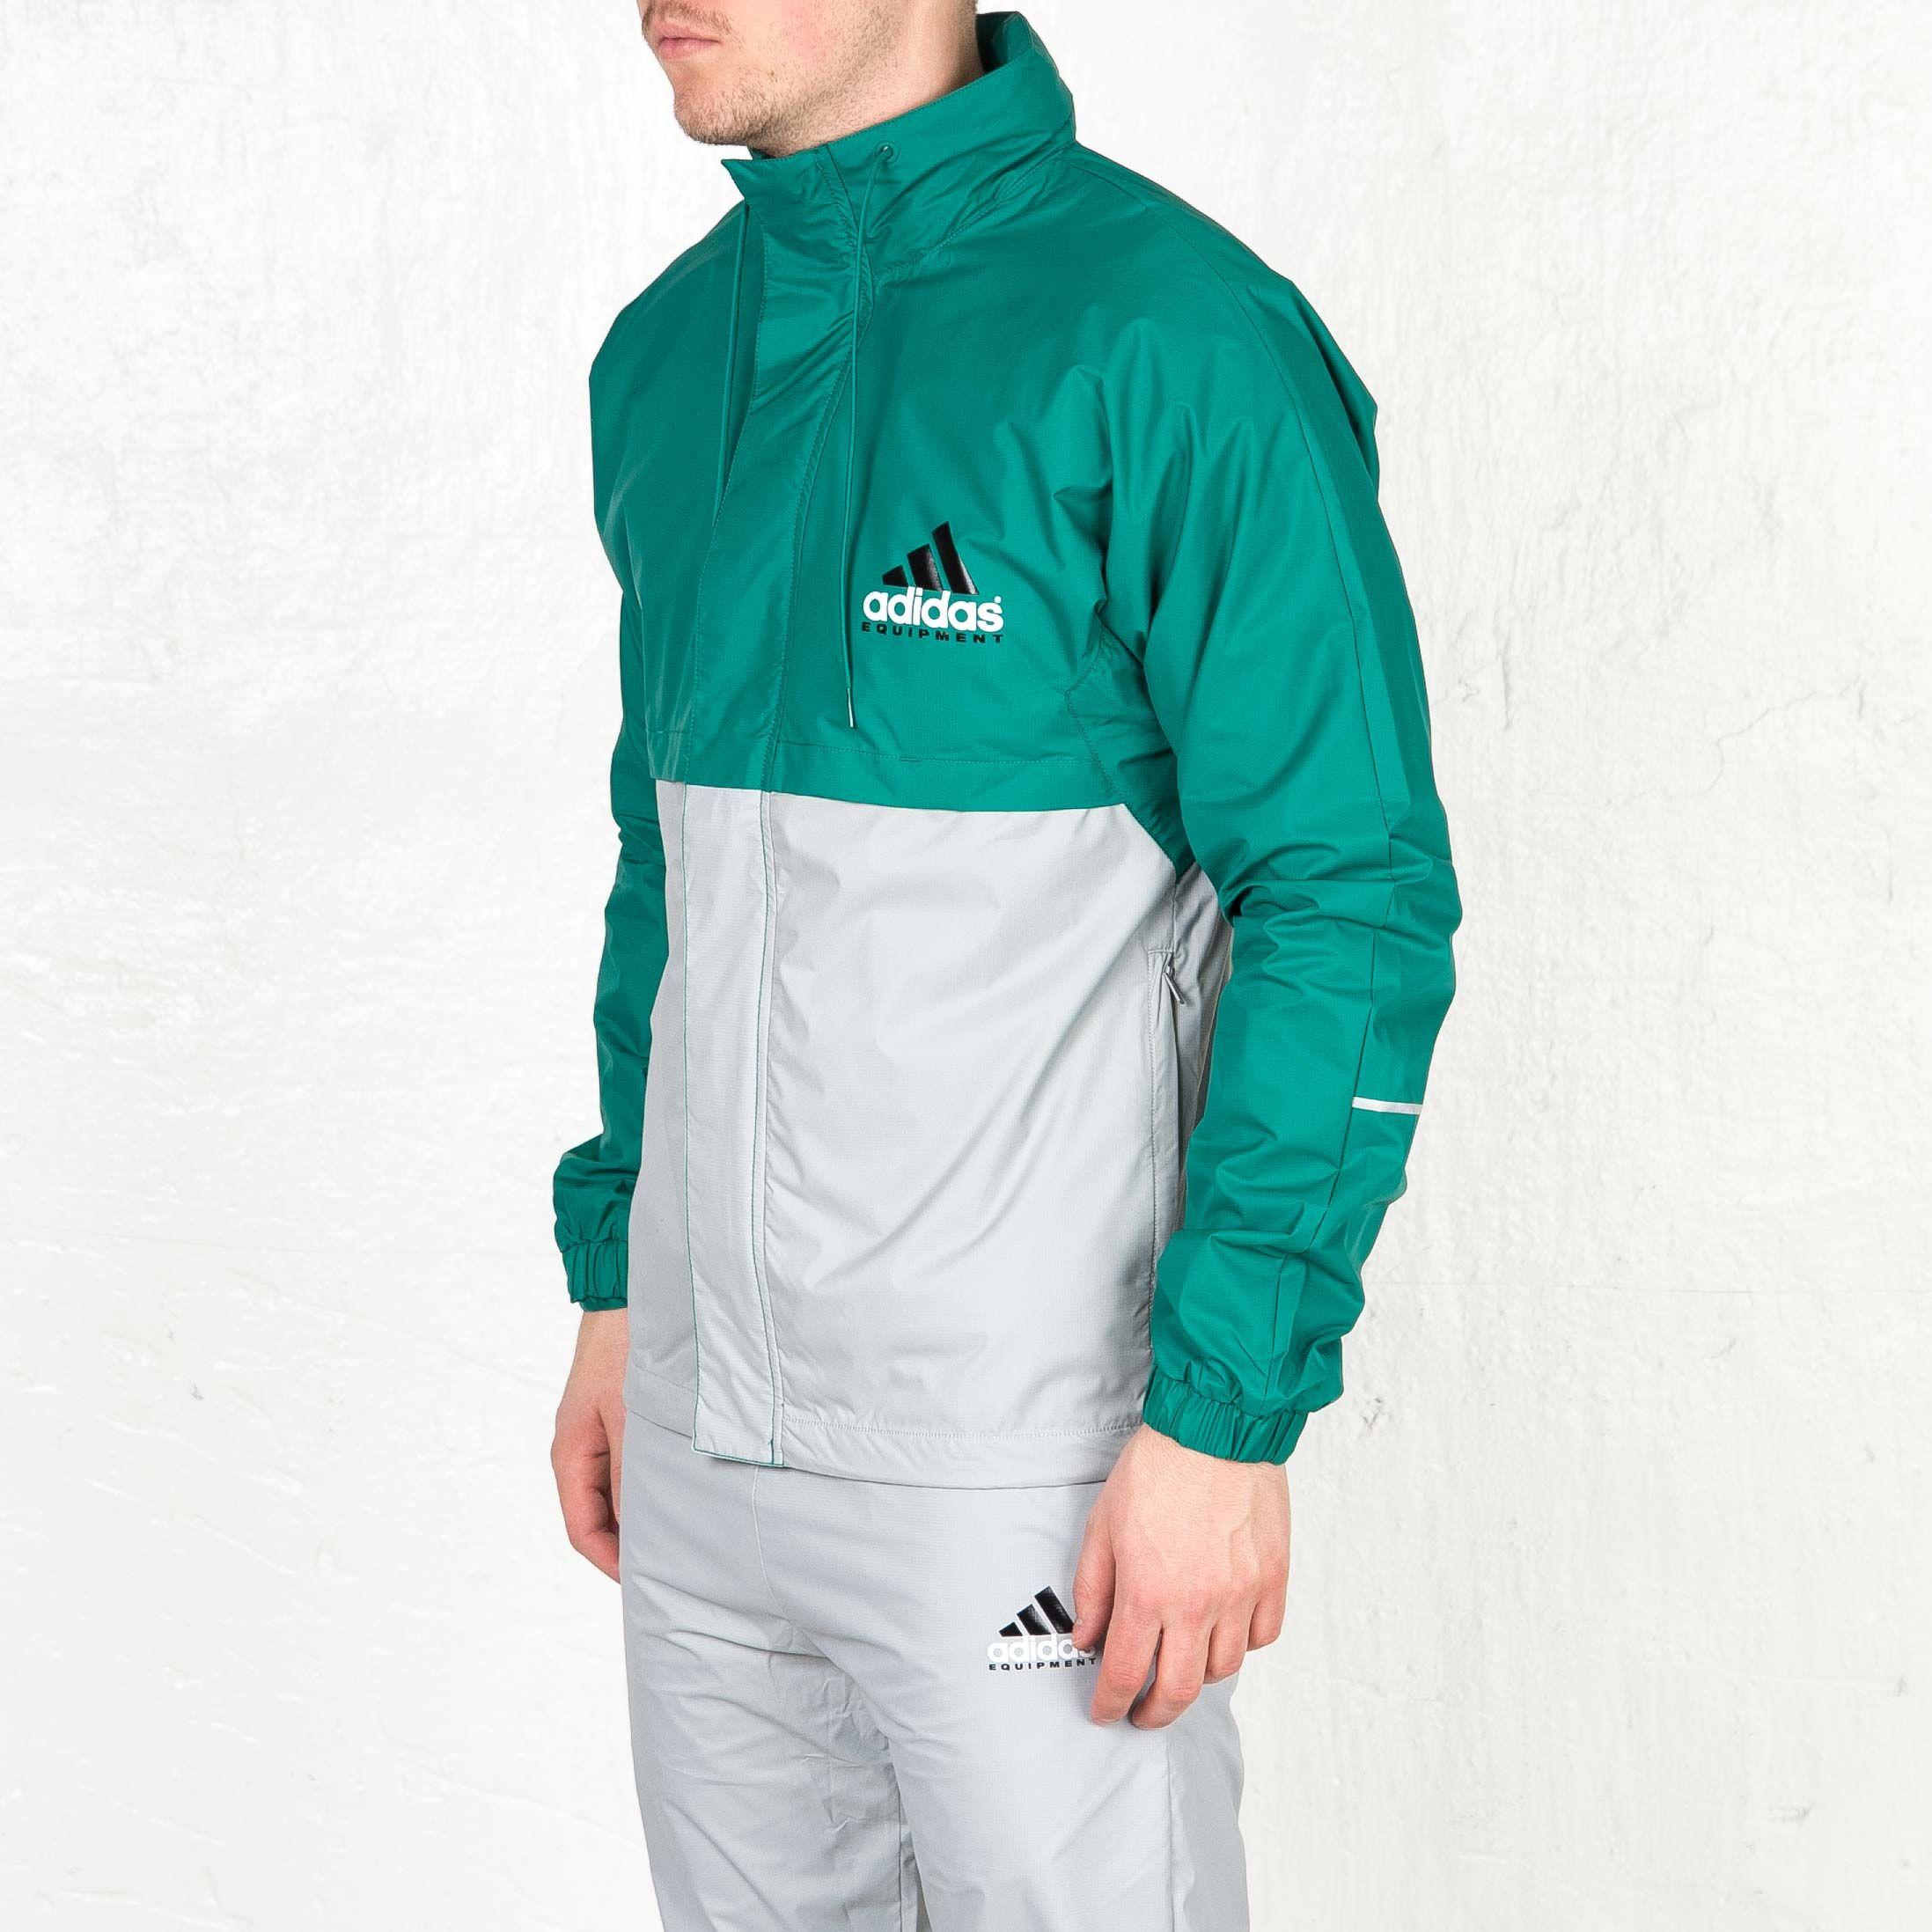 adidas EQT OG WB Top | Adidas, Tops, Adidas jacket